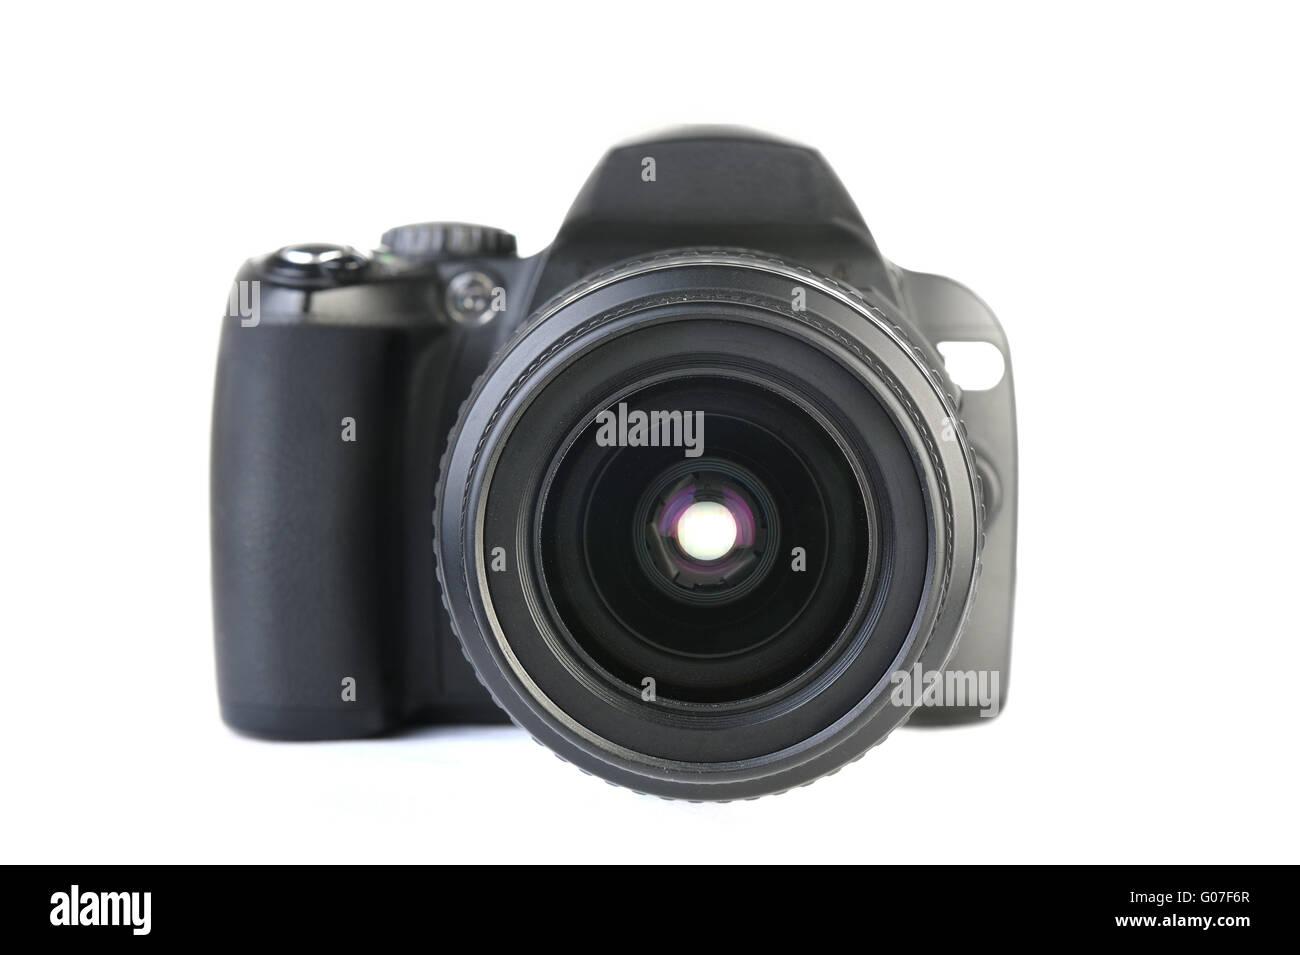 Digital photo camera - Stock Image